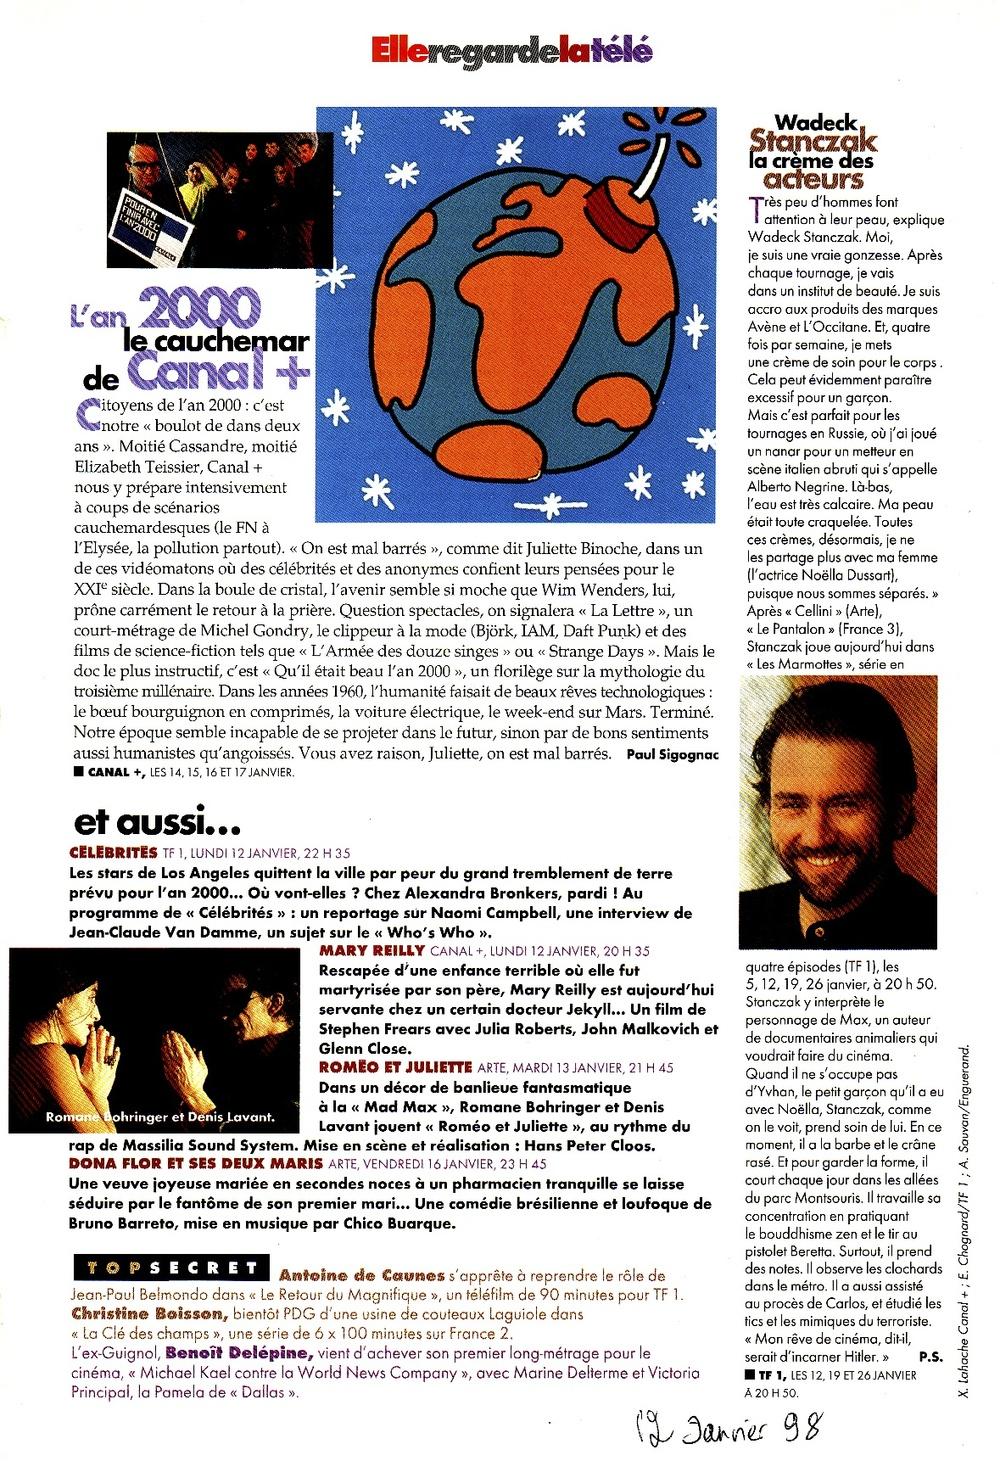 press-1998-004